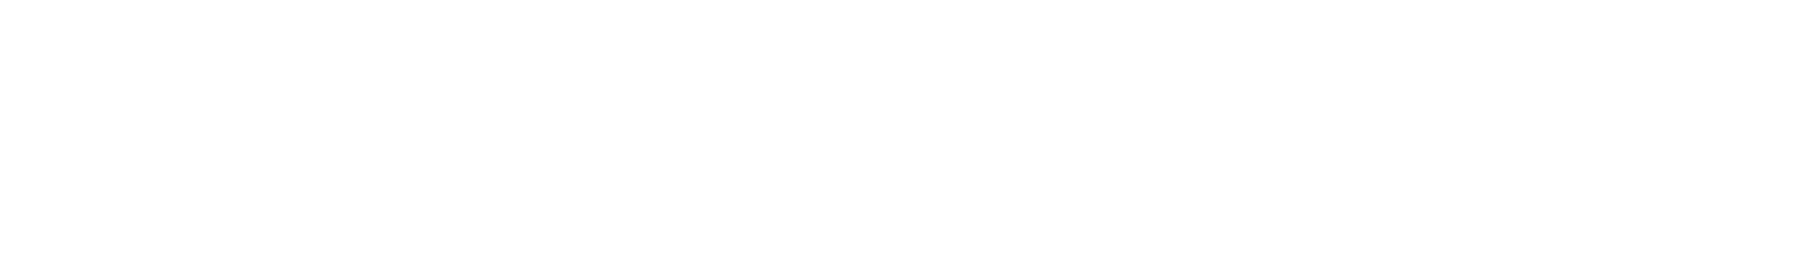 guitarrock04 80